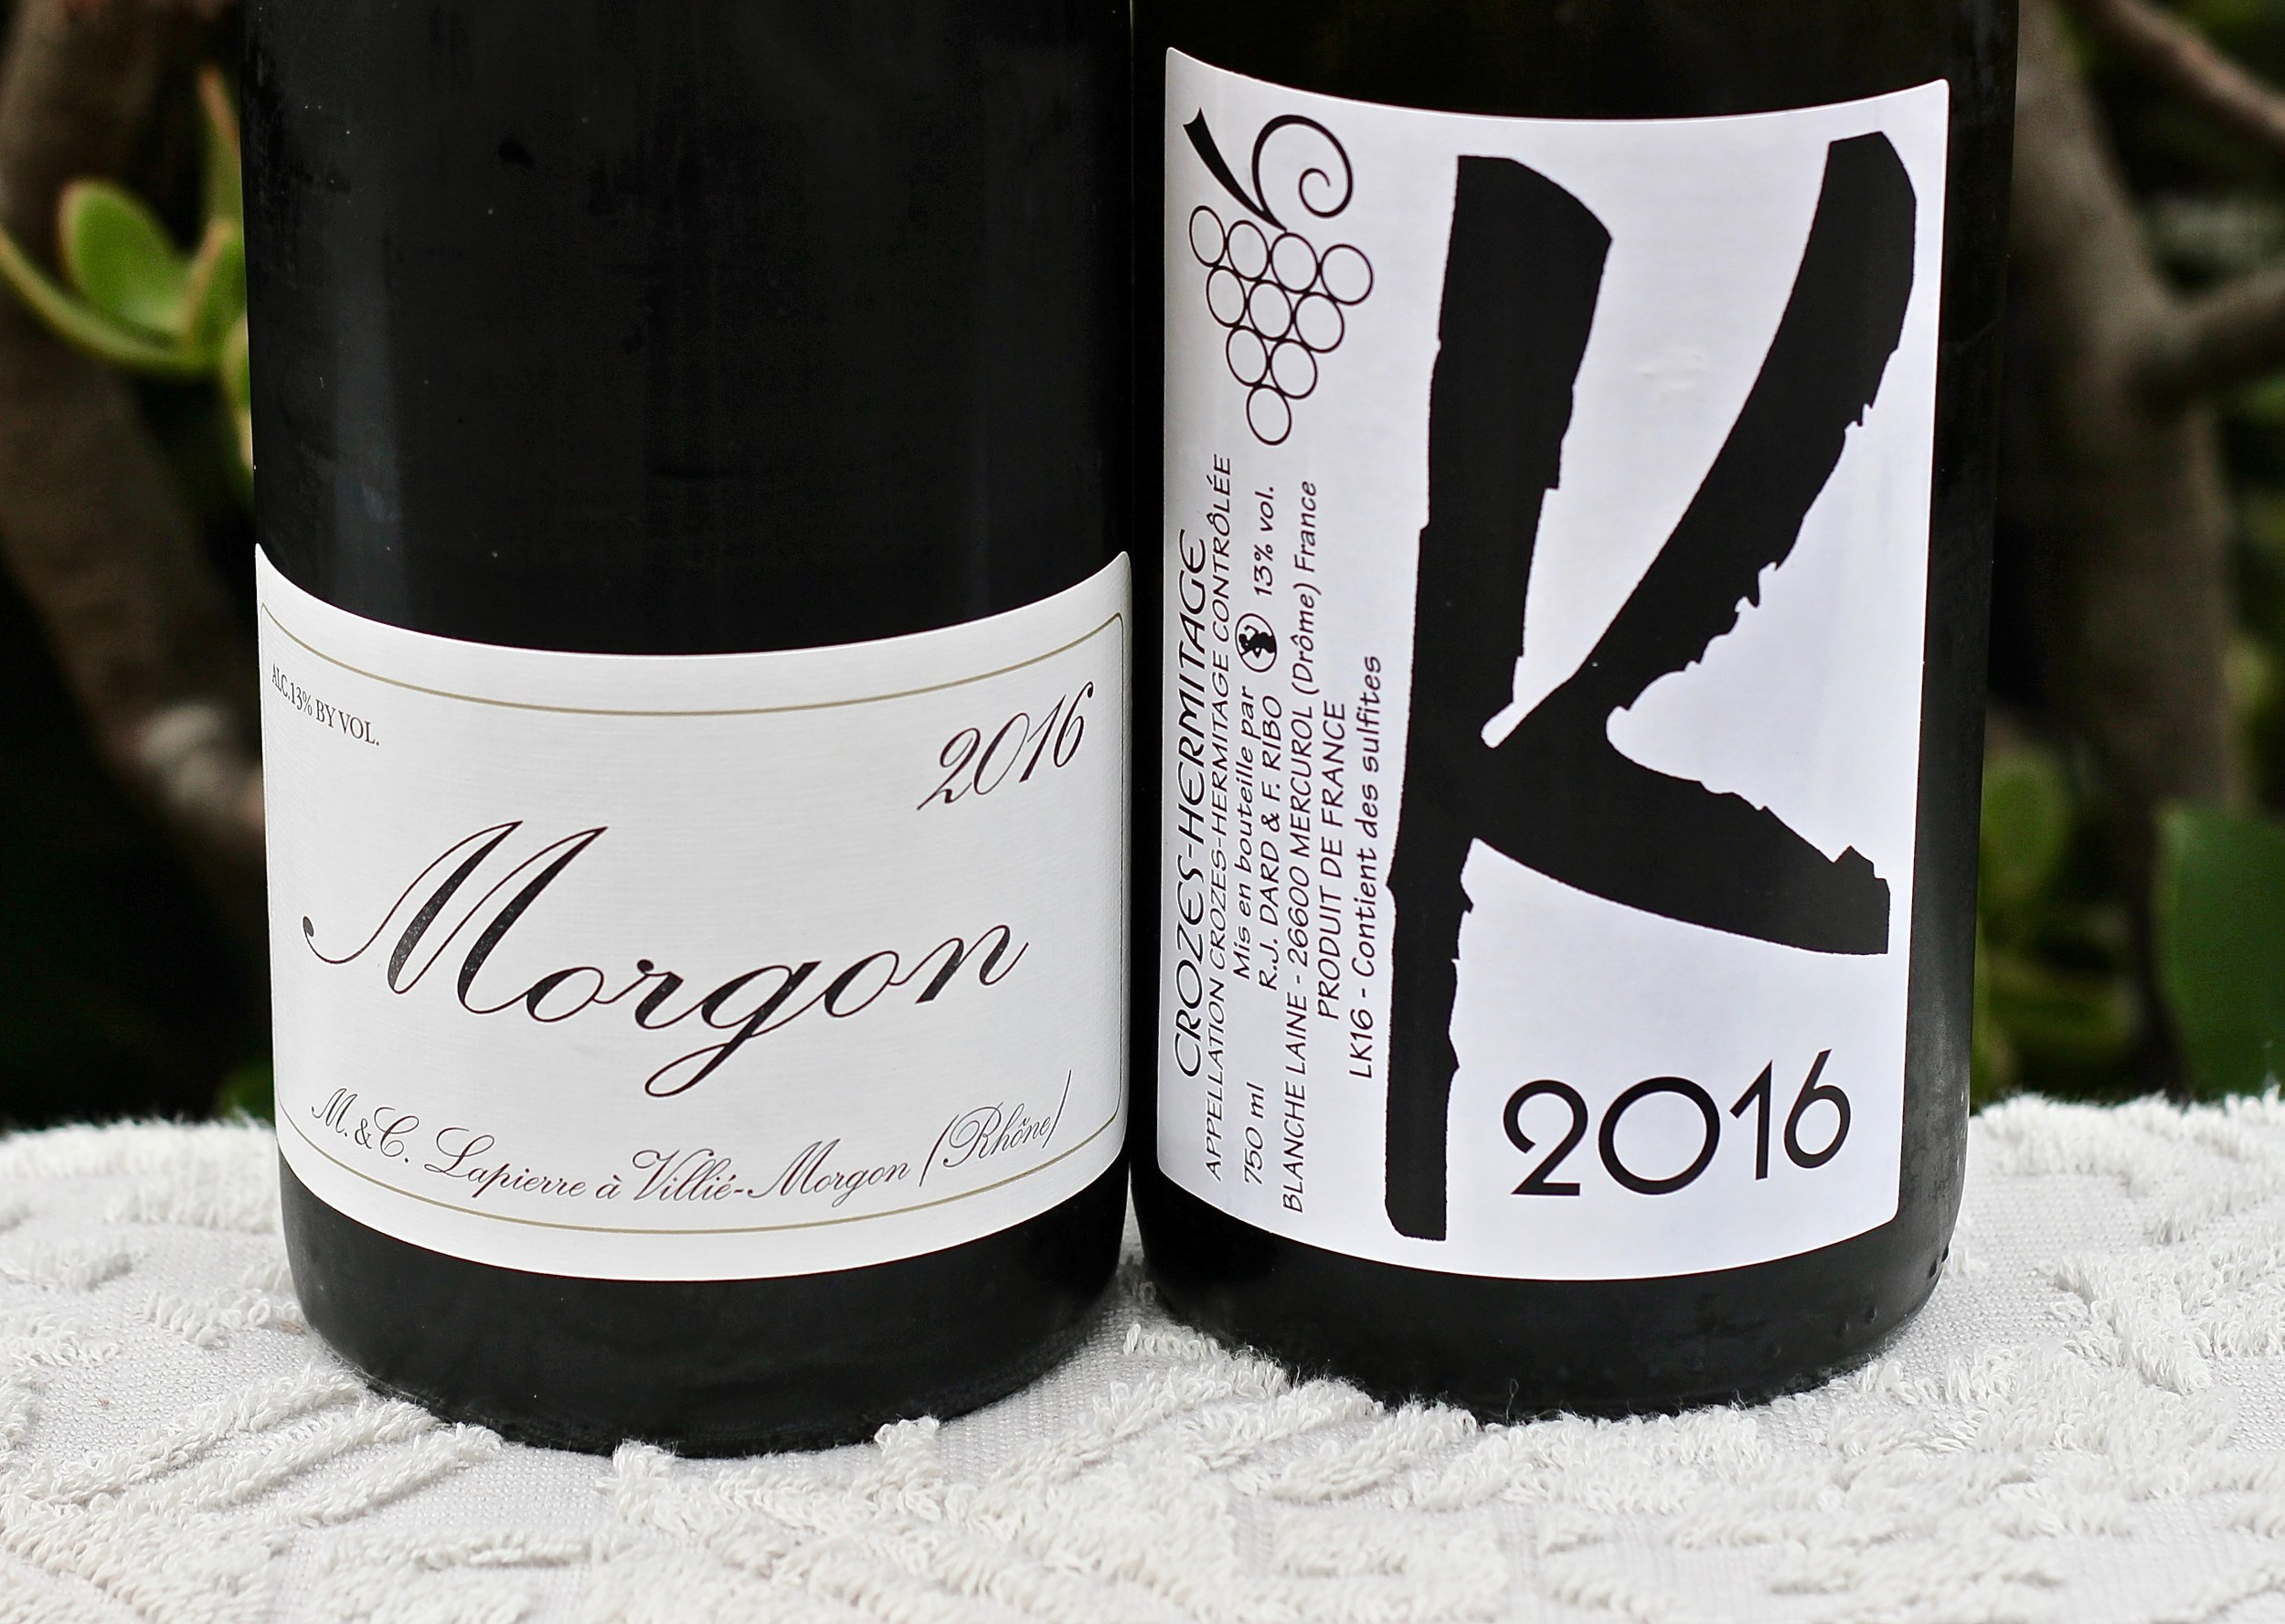 Natural Selections - 2016 Lapierre Morgon (N)2016 Dard & Ribo Crozes Hermitage Blanc Les Karrieres